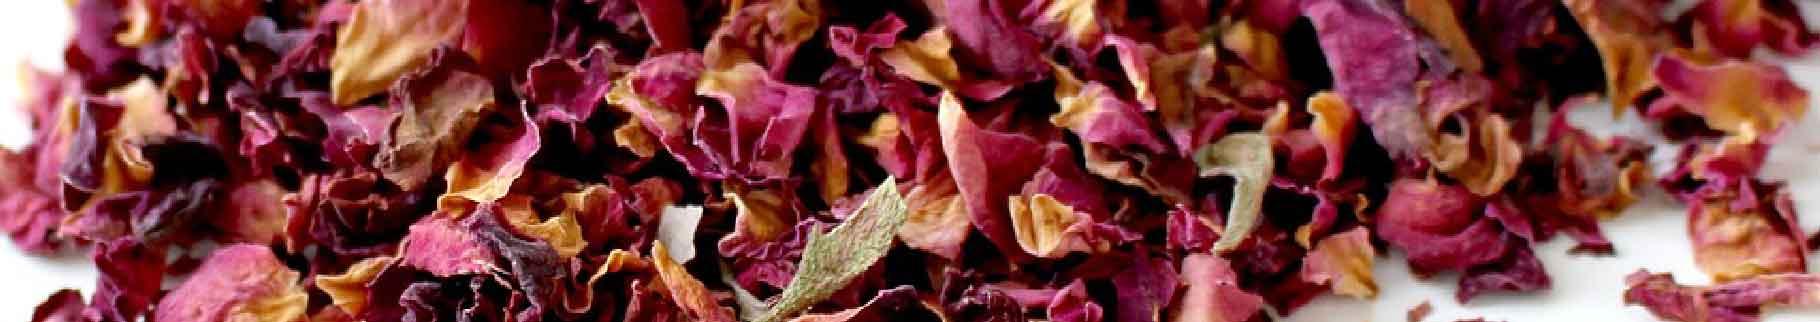 Symbolbild Rauchentwöhung - Blütenduft statt Tabakbrauch